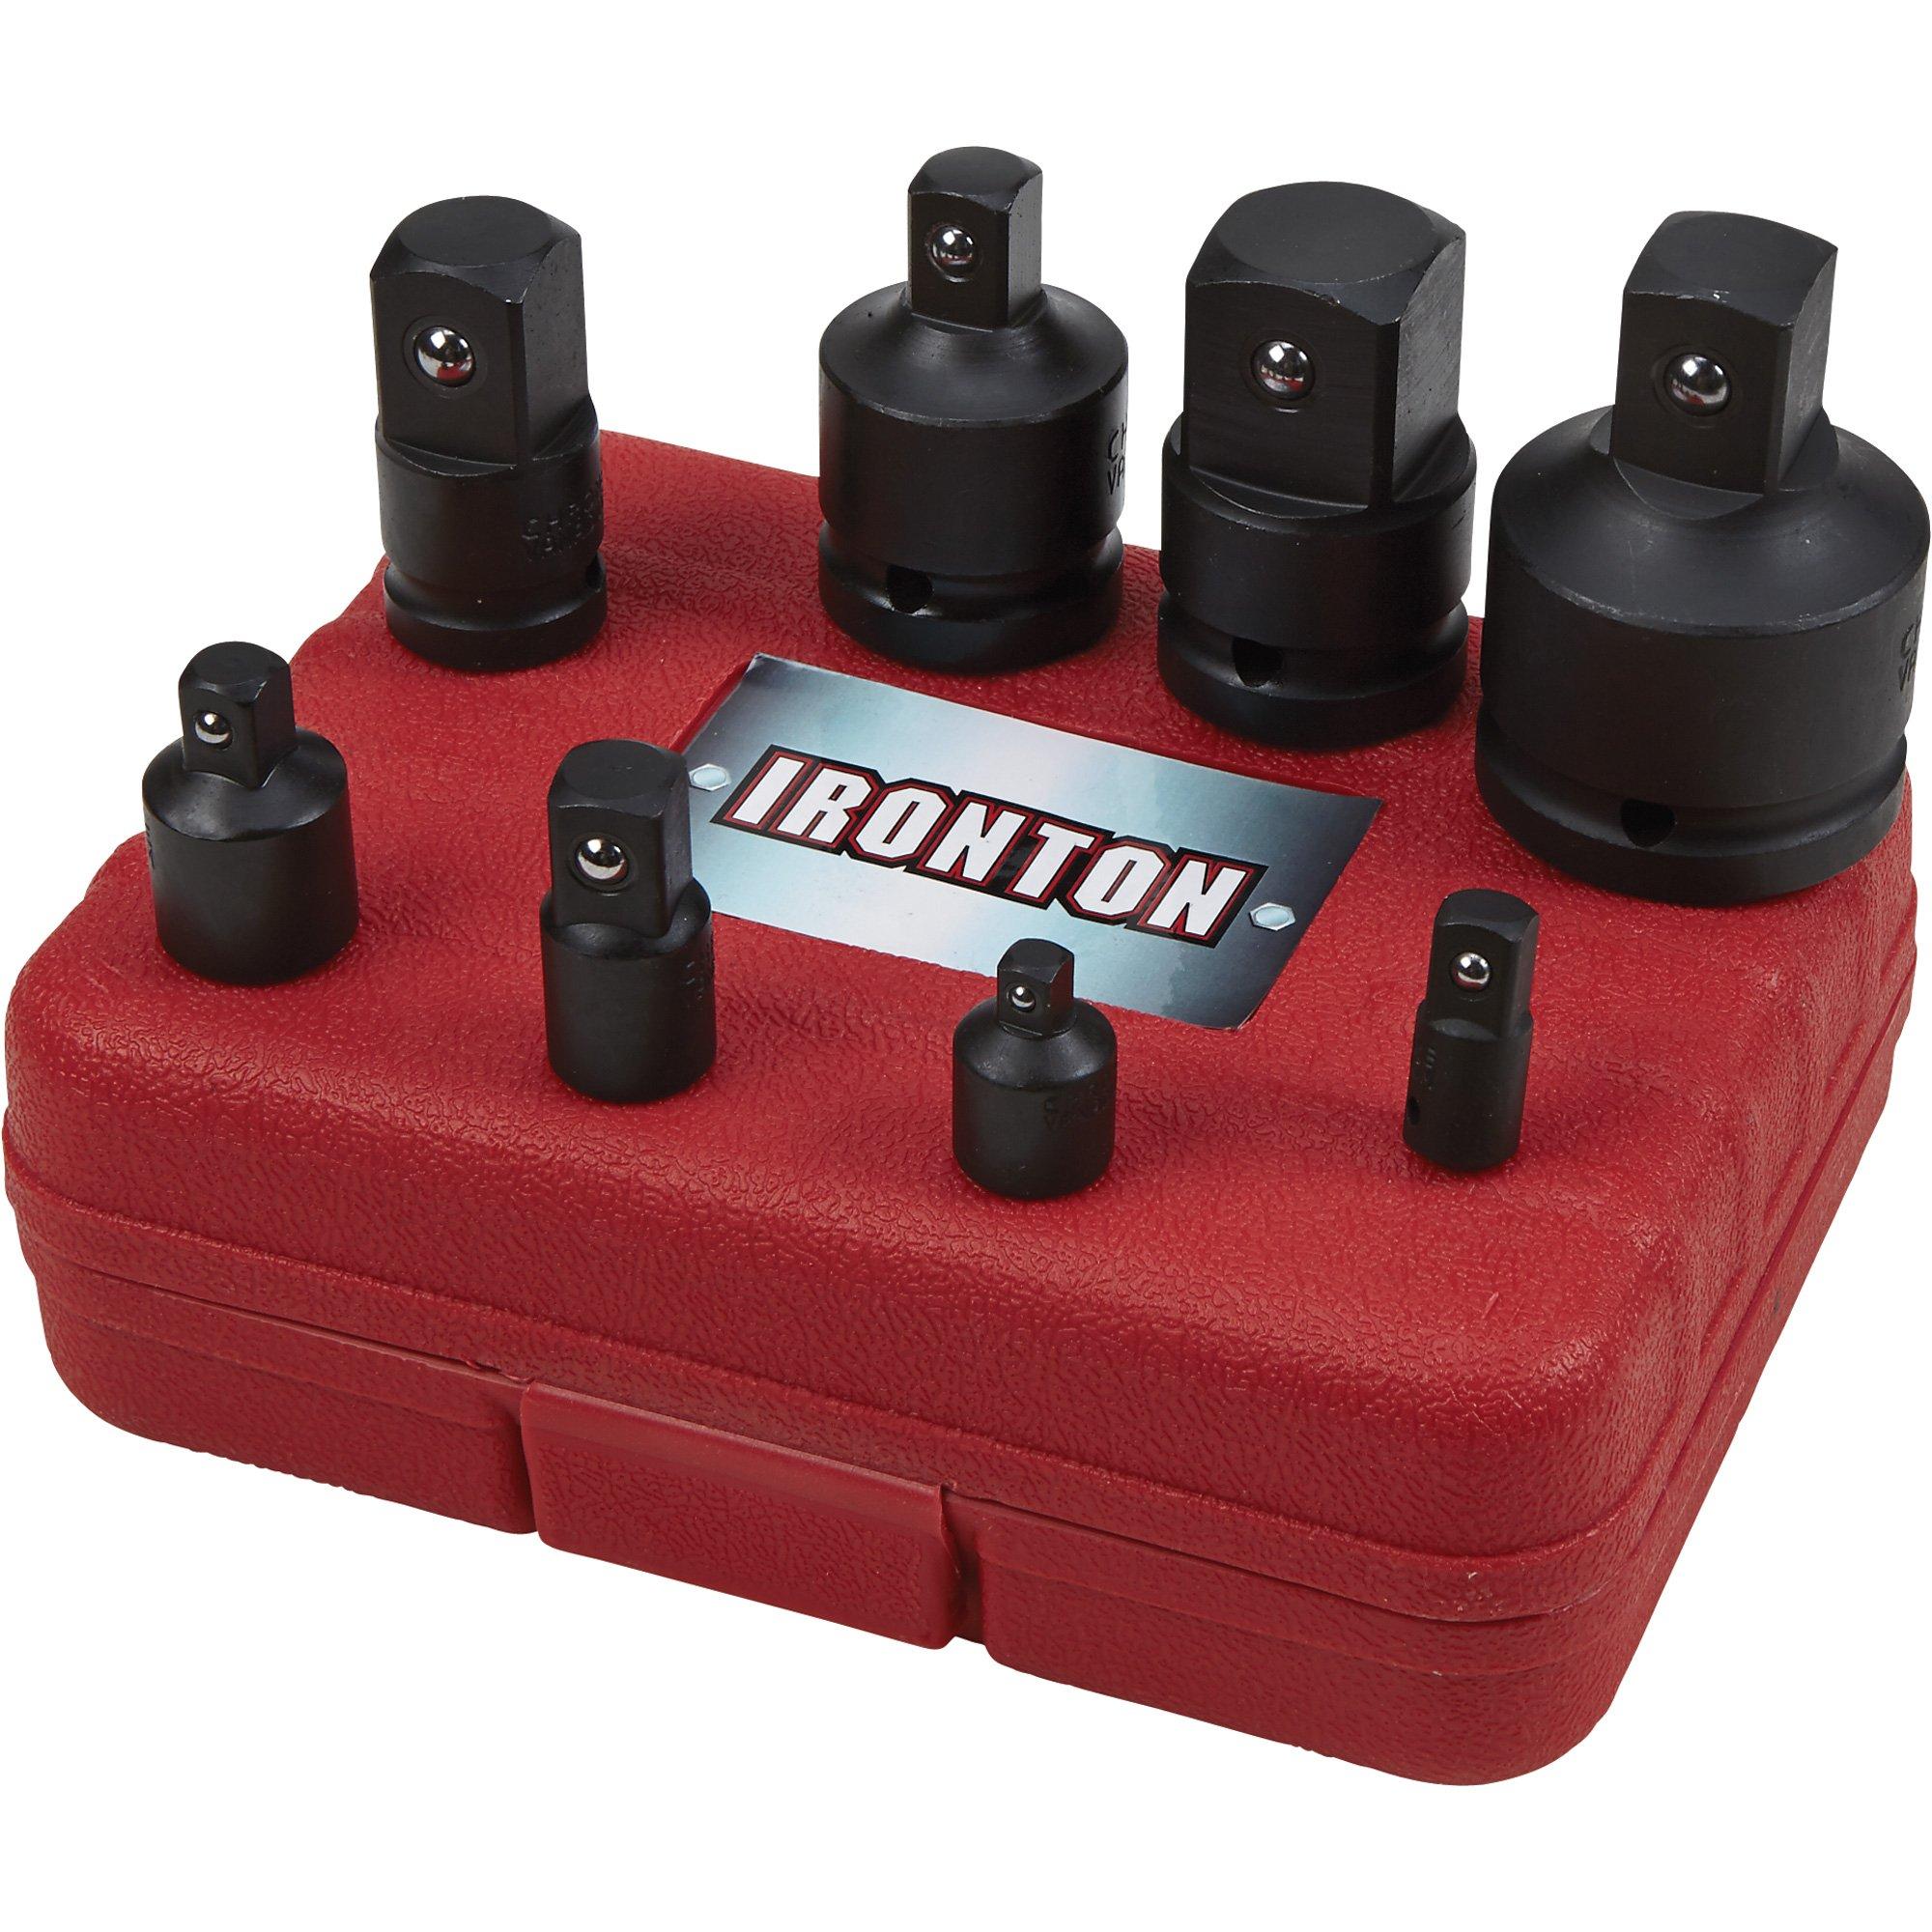 Ironton Impact Adapters - 8-Pc. Set by Ironton (Image #3)